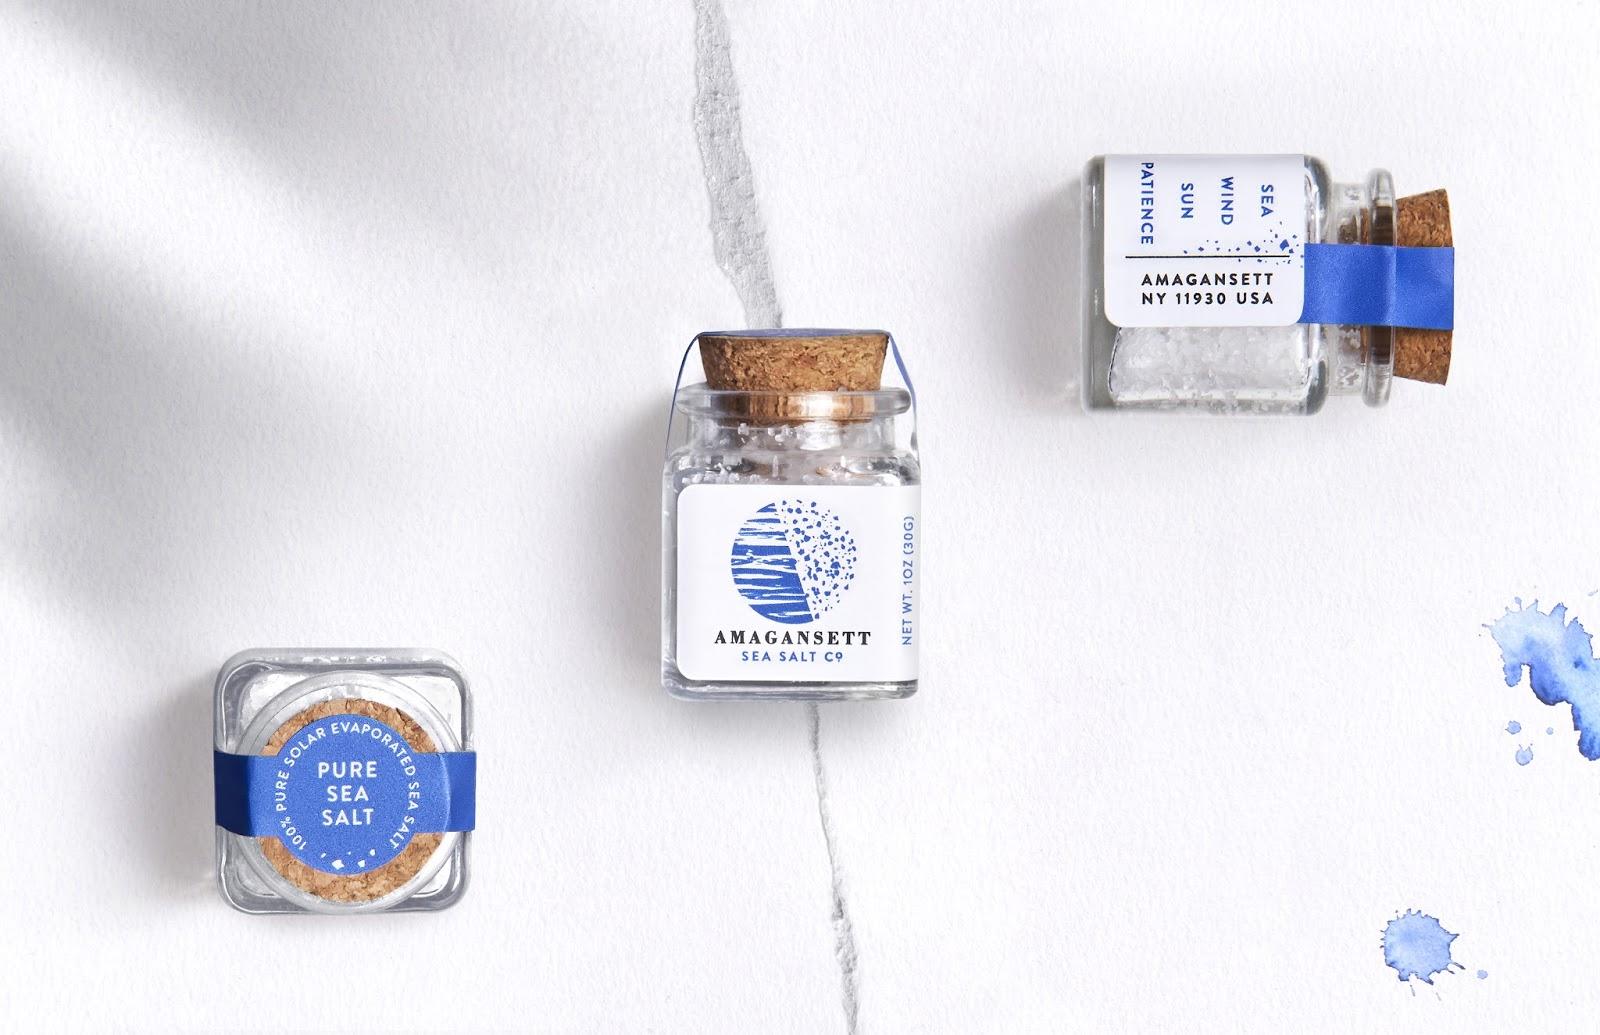 Amagansett Sea Salt on Packaging of the World - Creative Package Design Gallery